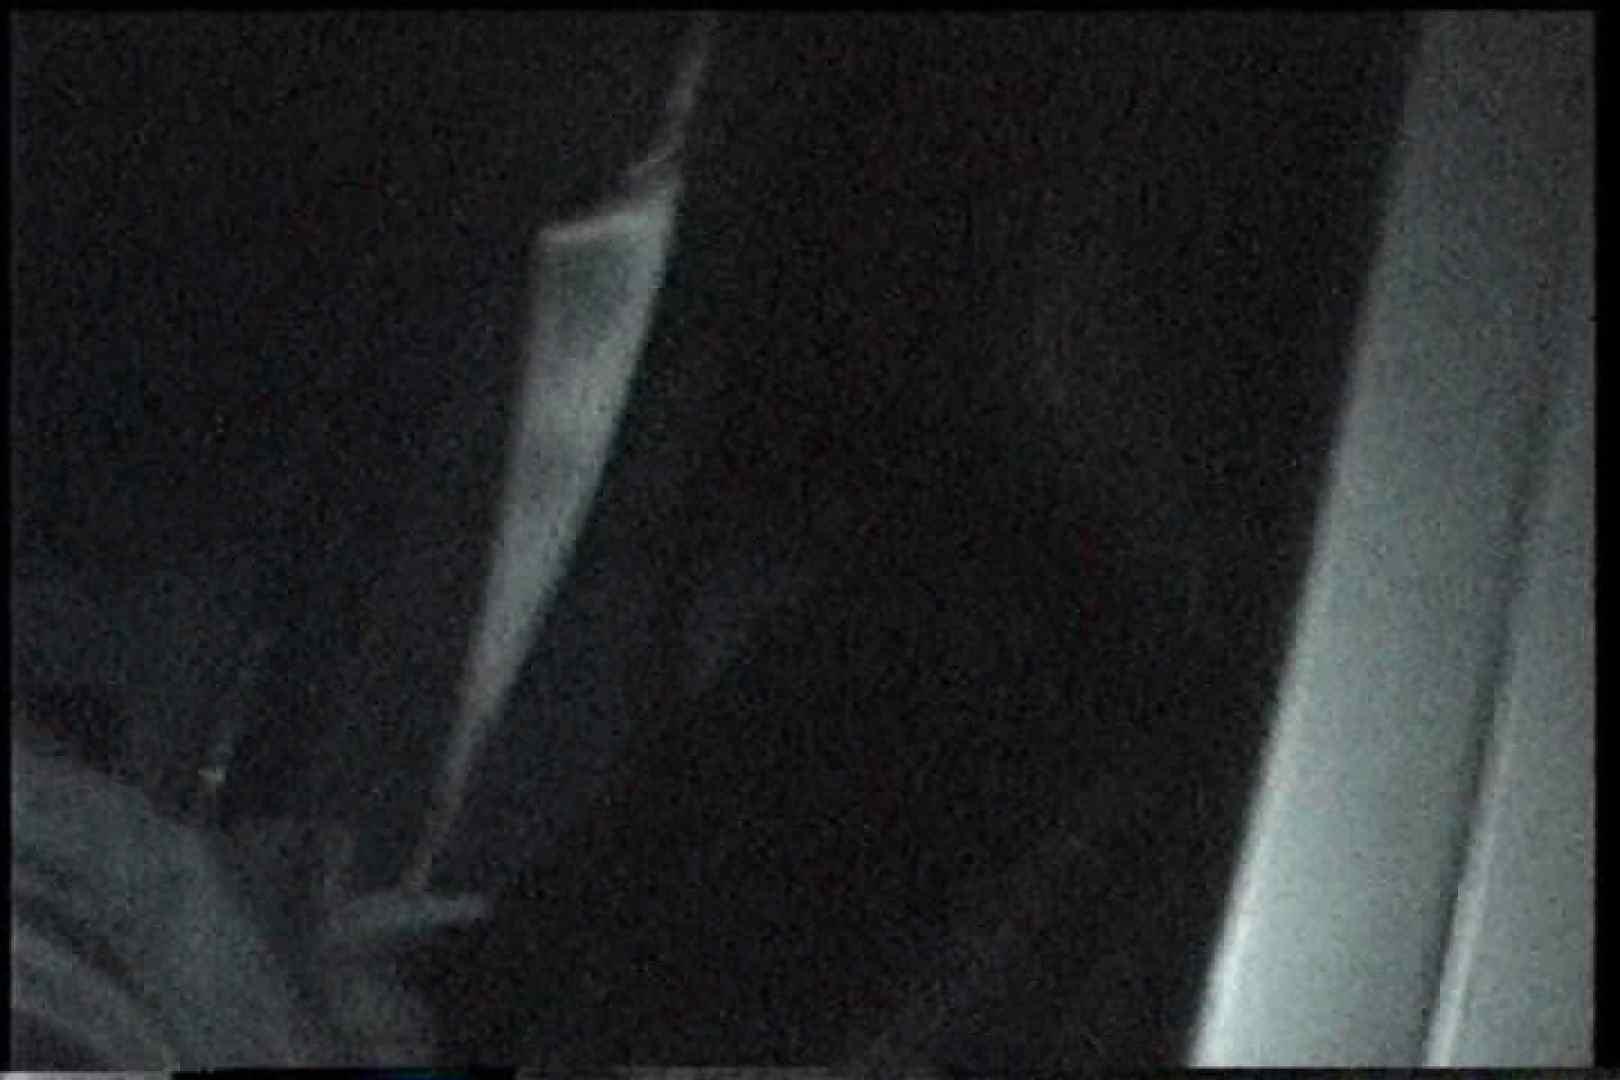 充血監督の深夜の運動会Vol.226 フェラ無修正 盗撮動画紹介 67画像 23